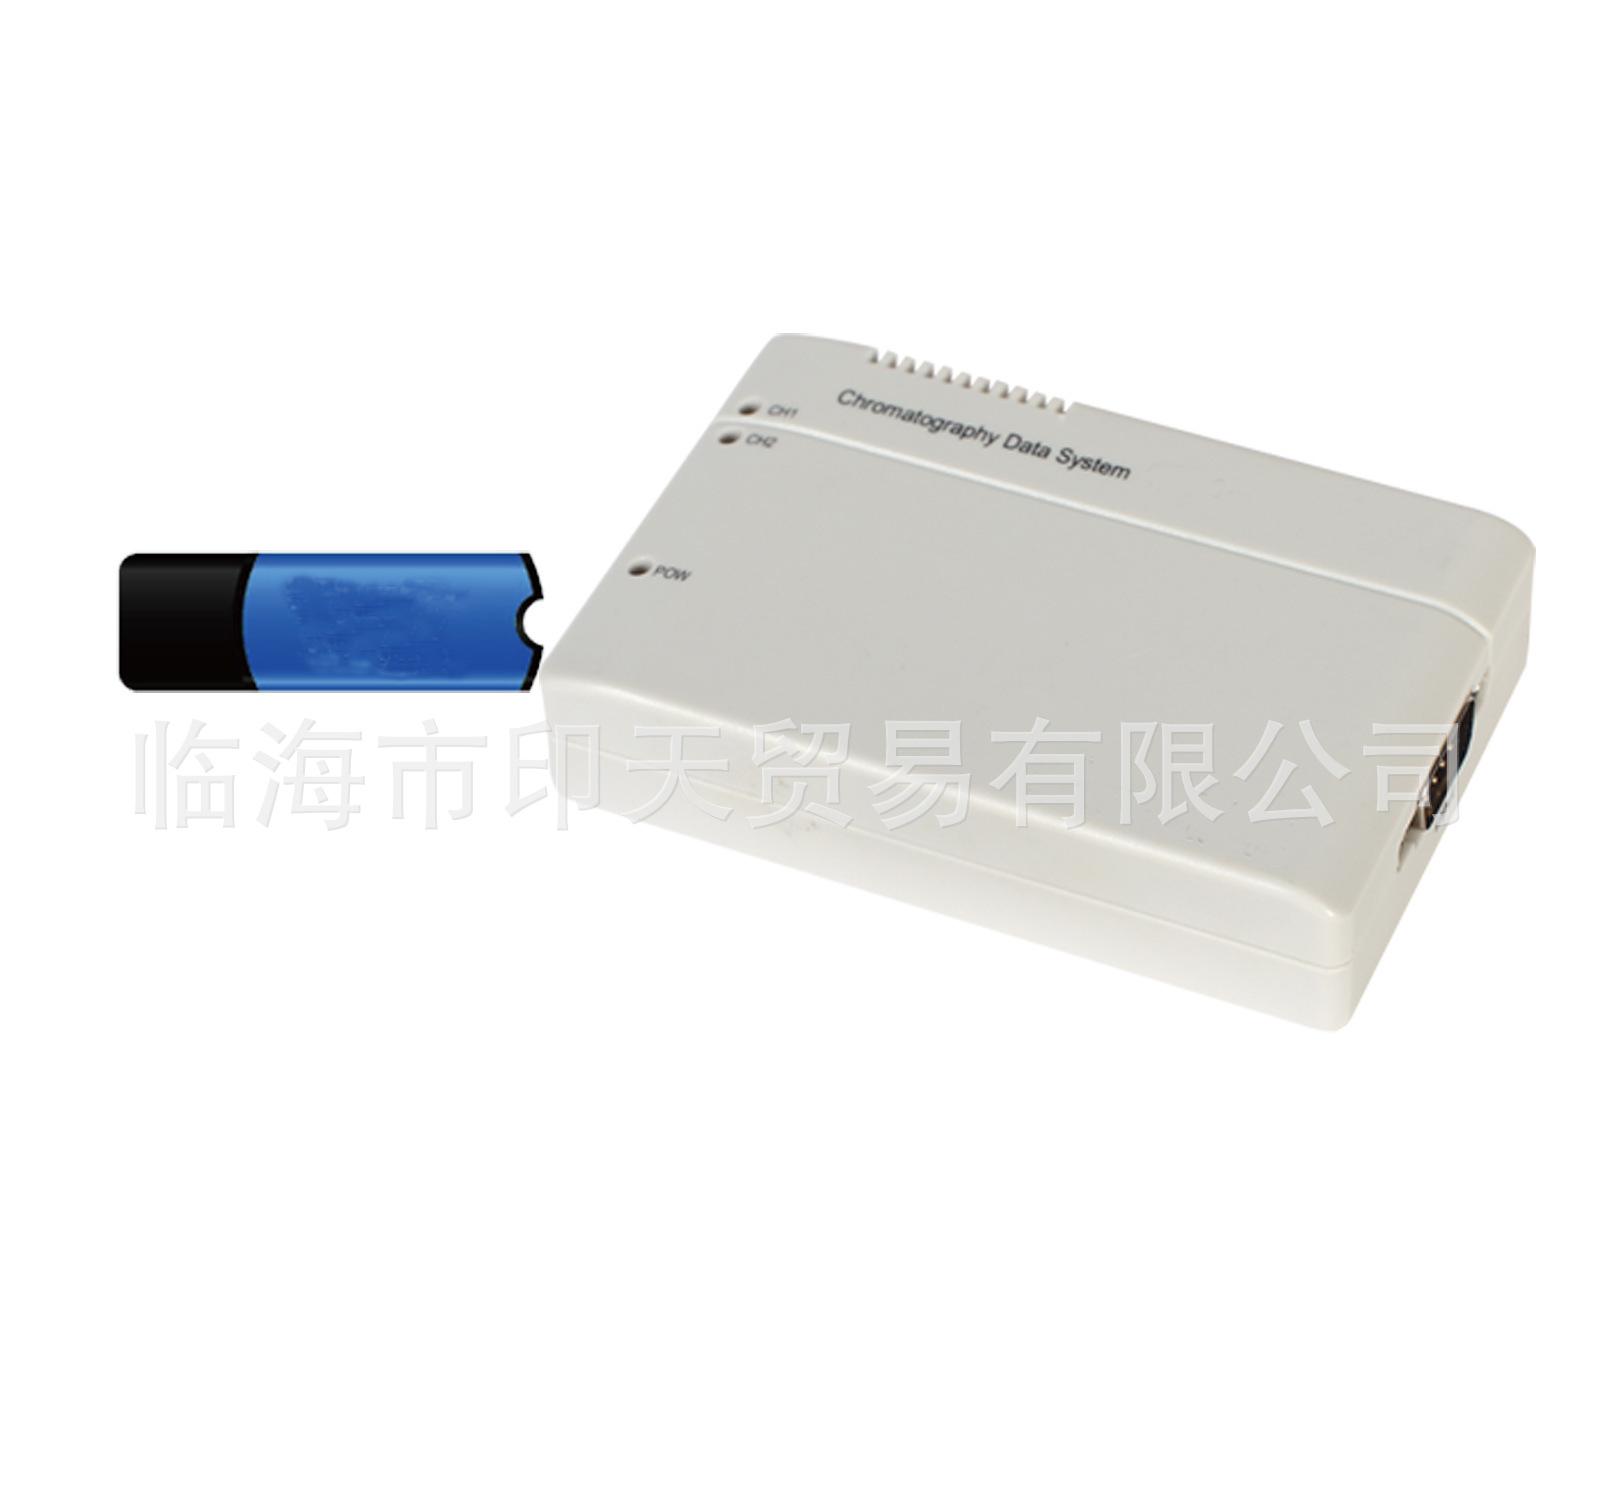 VI2010色谱数据工作站(USB版) 色谱工作站 气液相通用数据处理